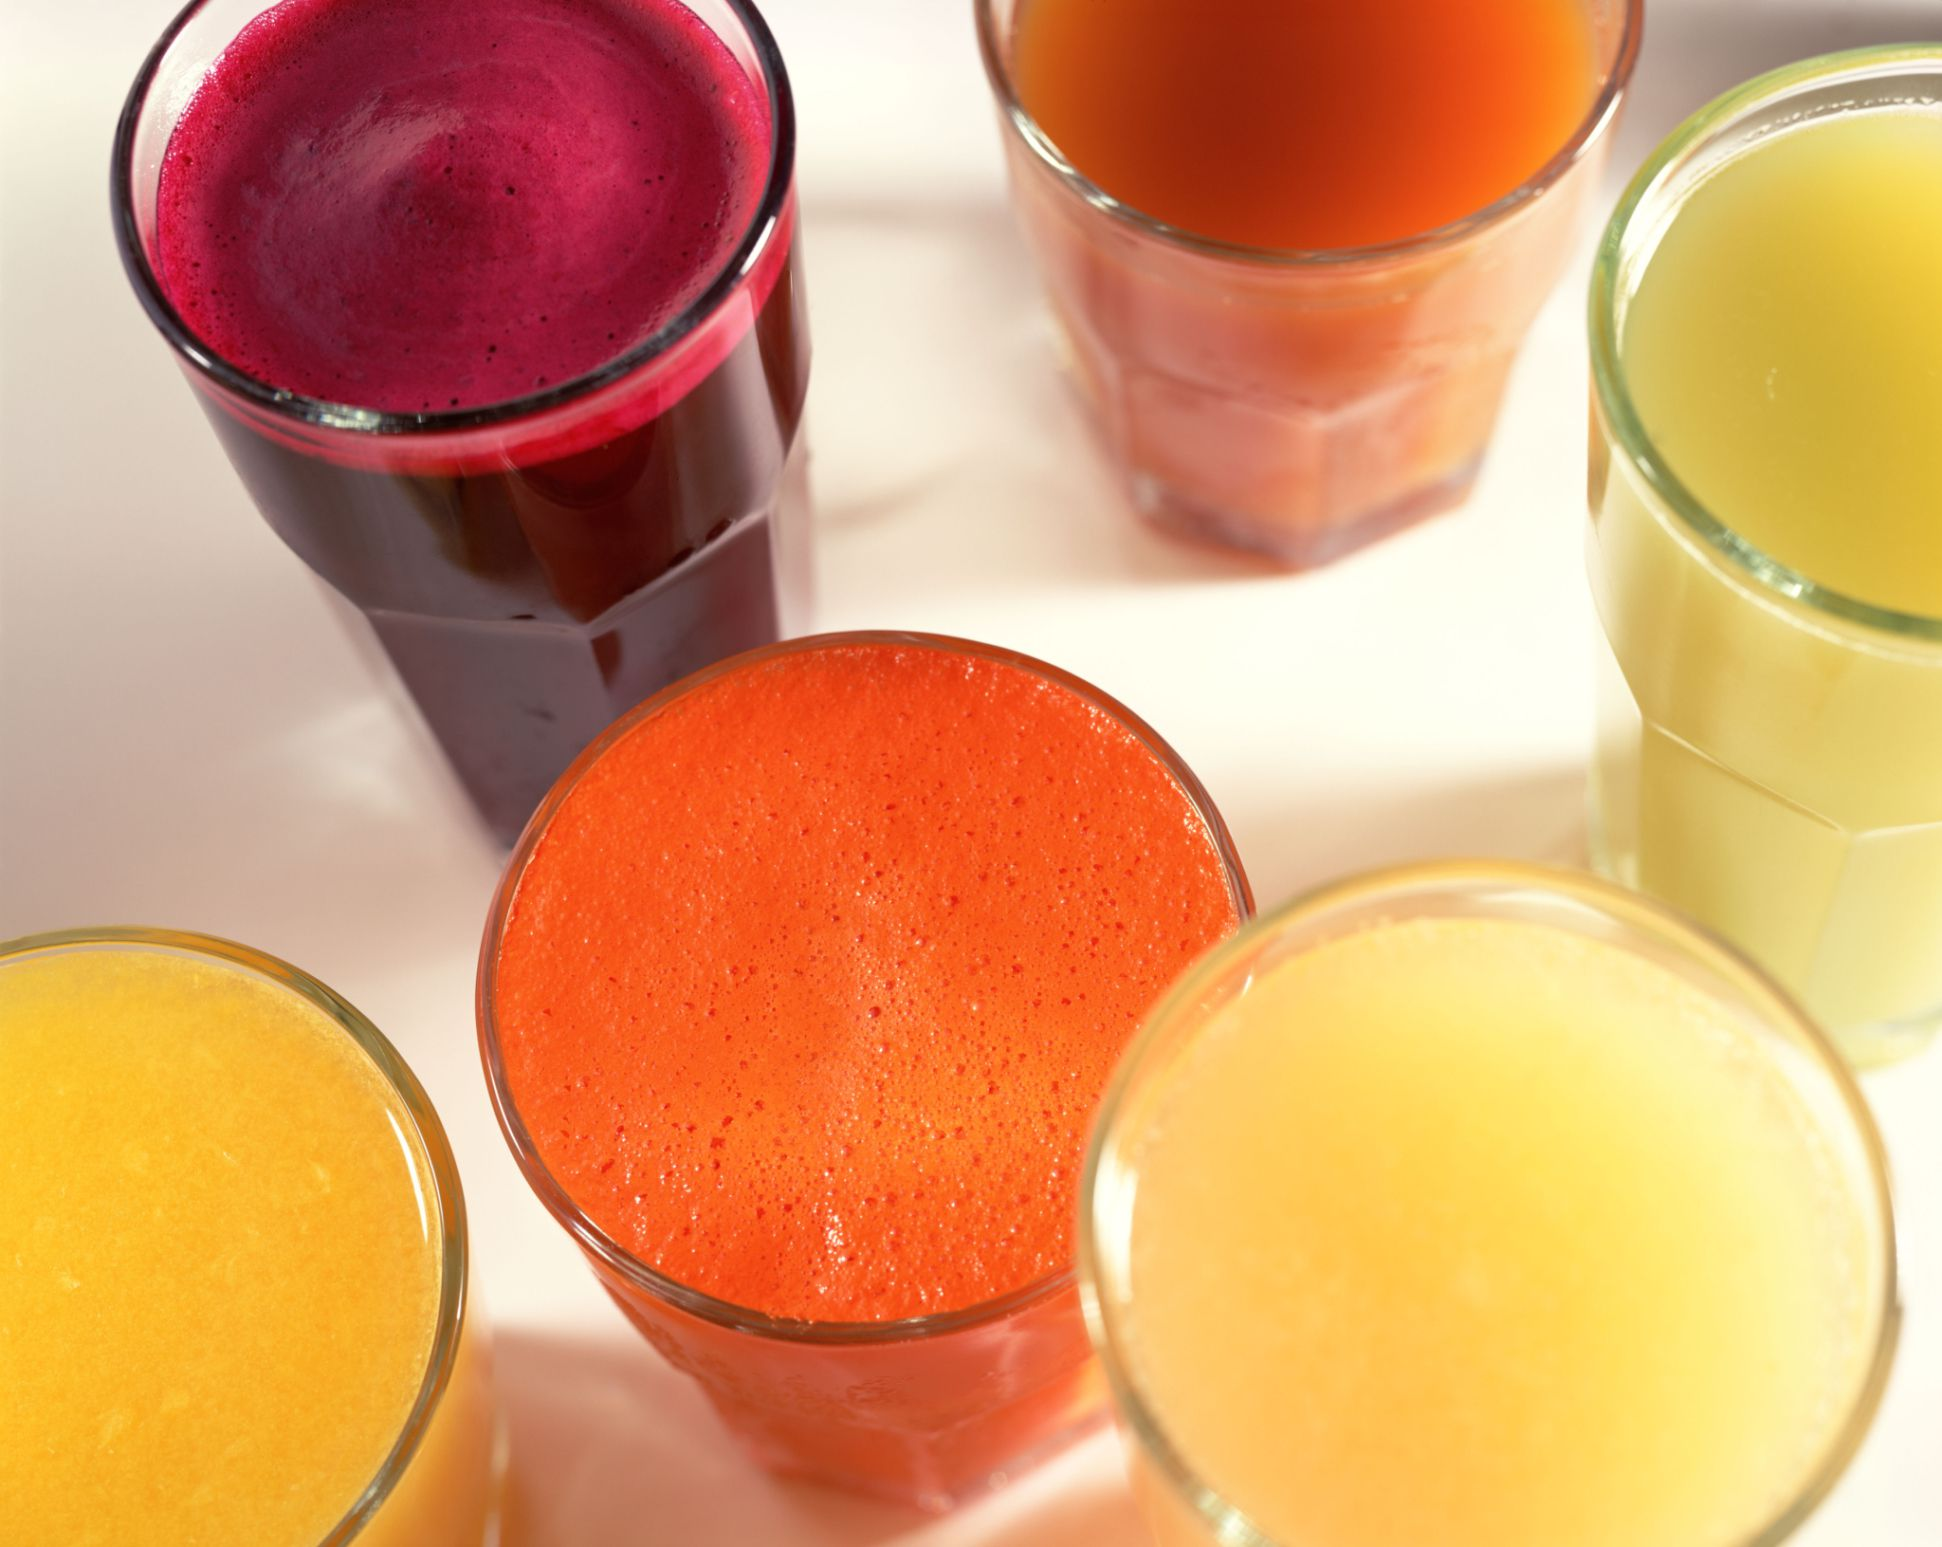 Which Brands Of Juices Are Gluten Free E Juice Liquid Frosty Juiceango Apple Original 100 Not Ejm